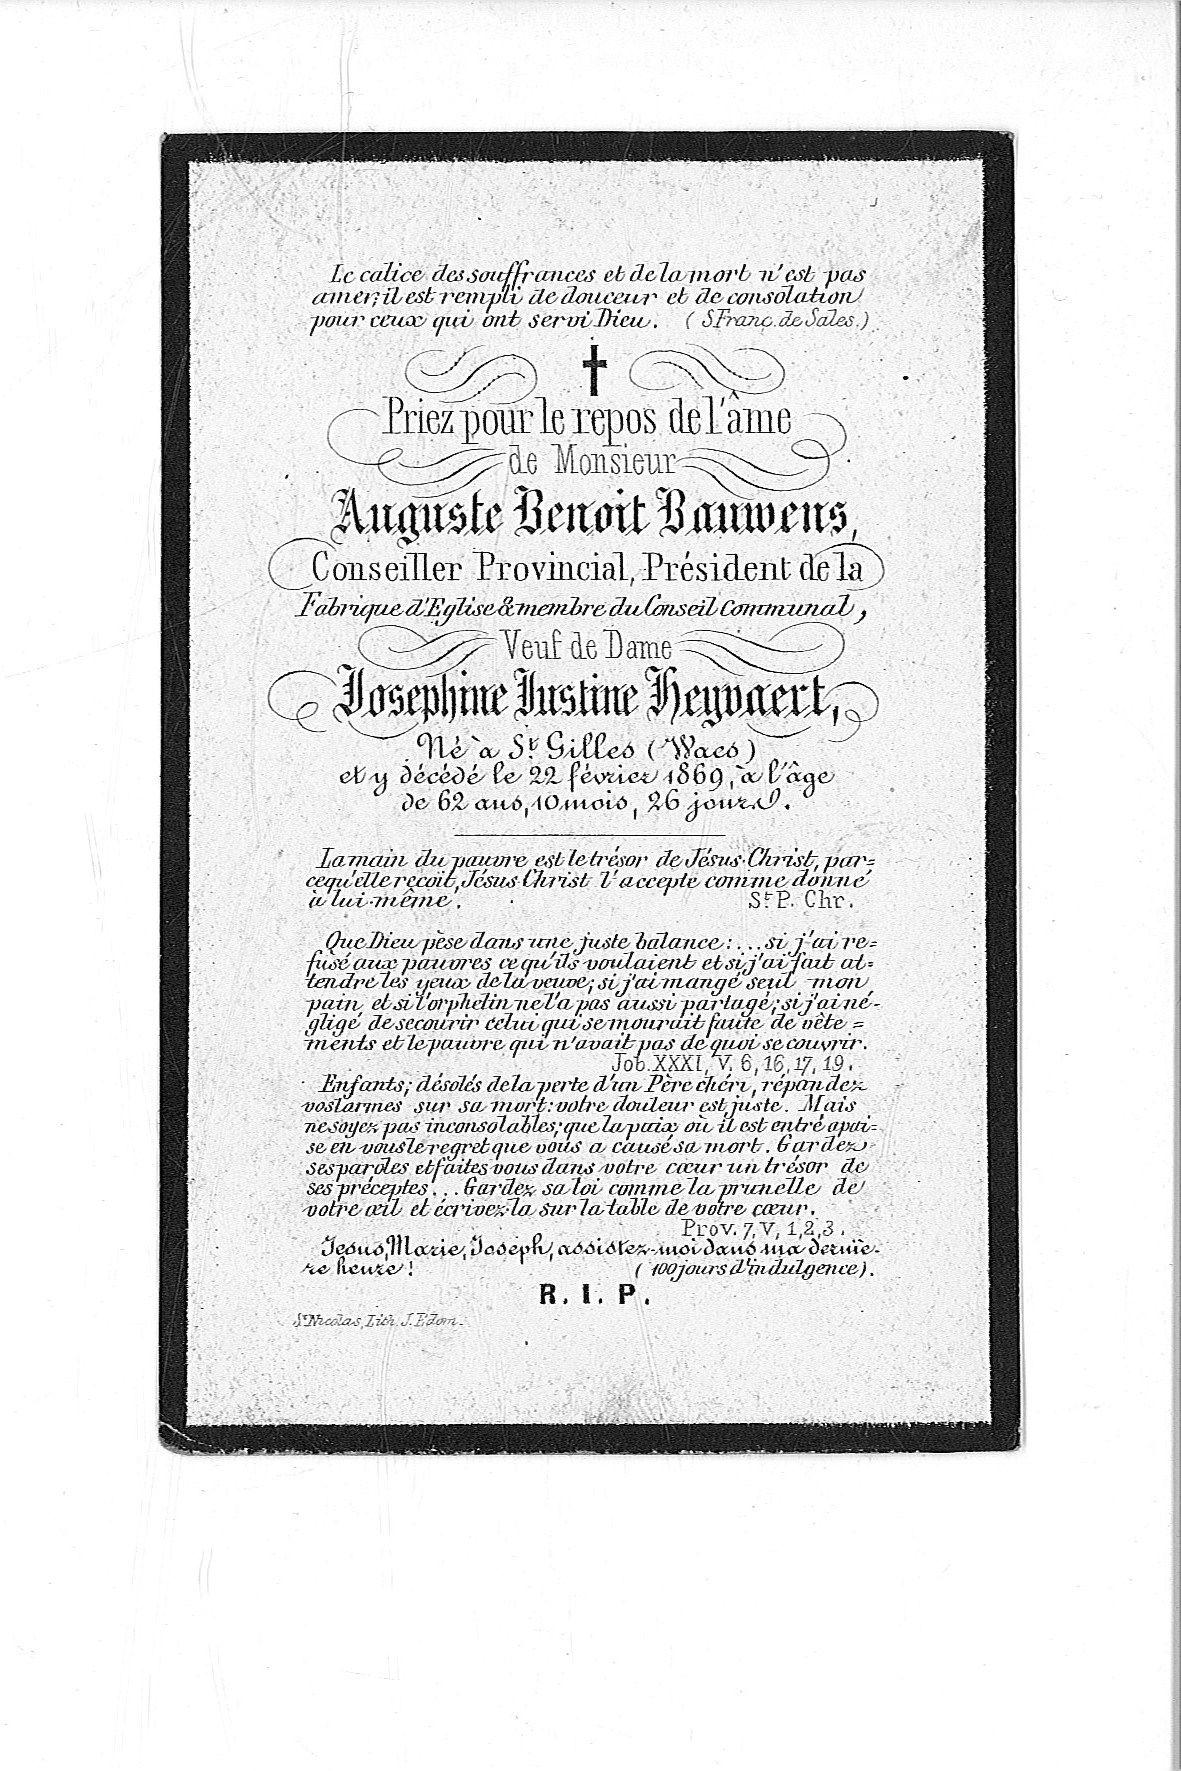 Auguste-Benoit(1869)20090806114958_00003.jpg